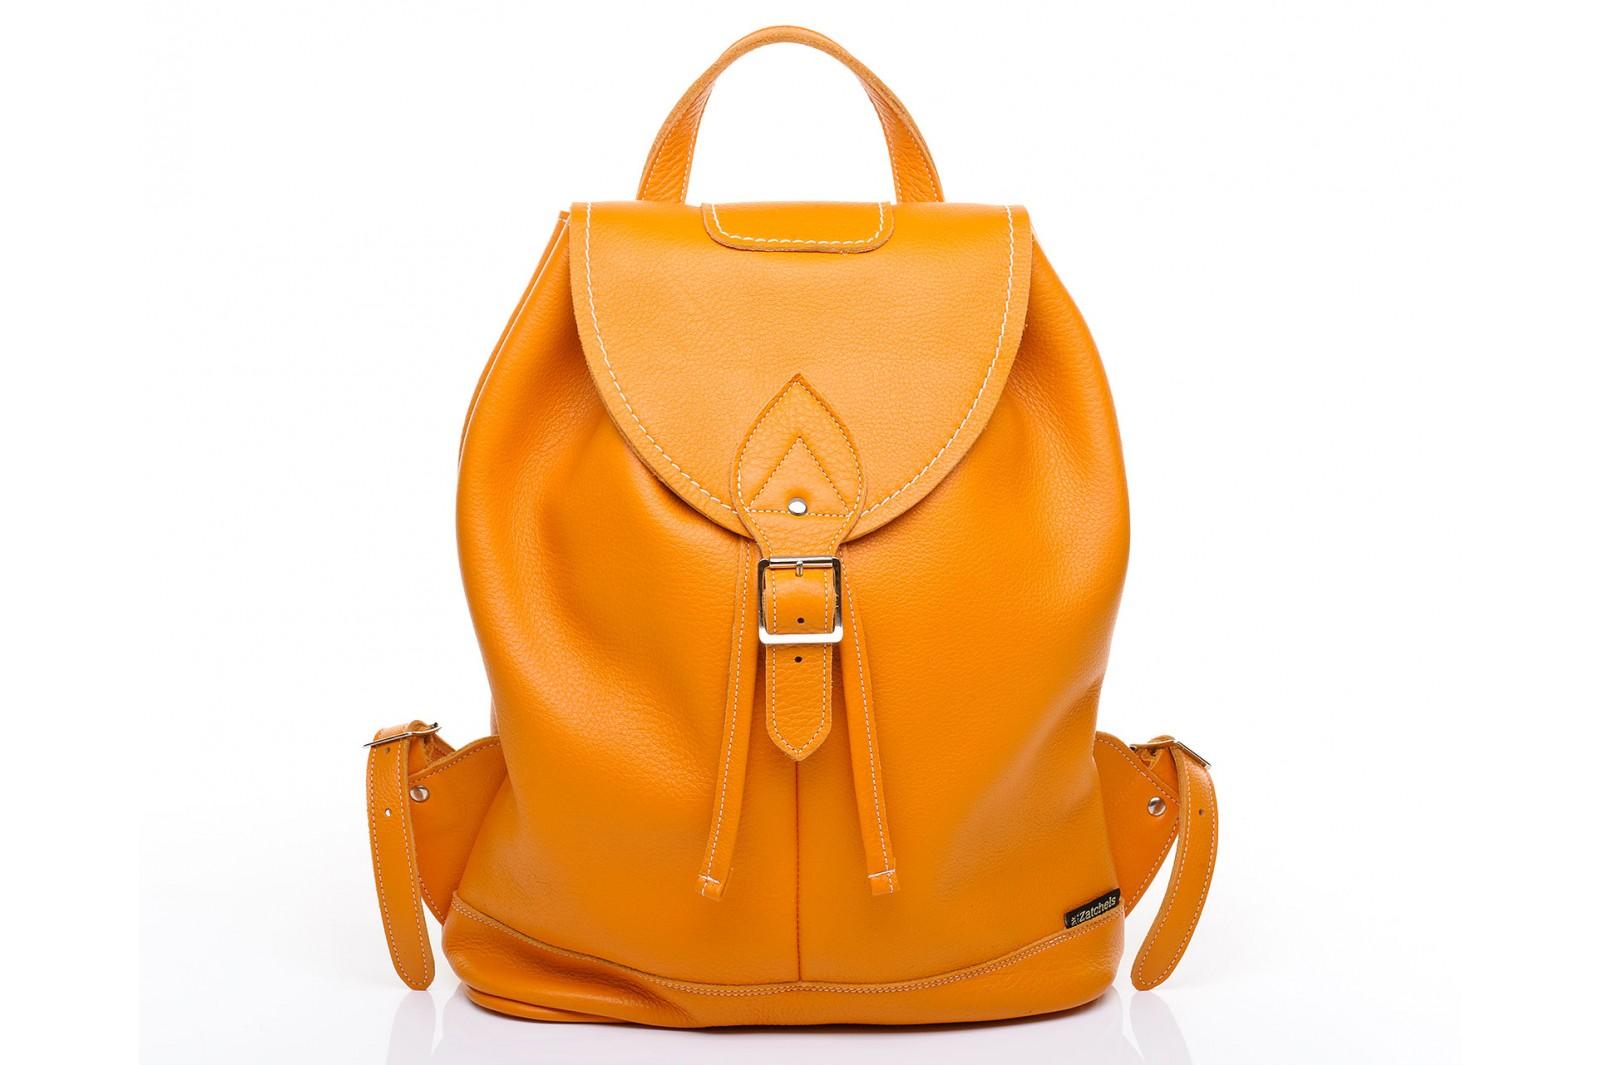 Zatchel Tangerine